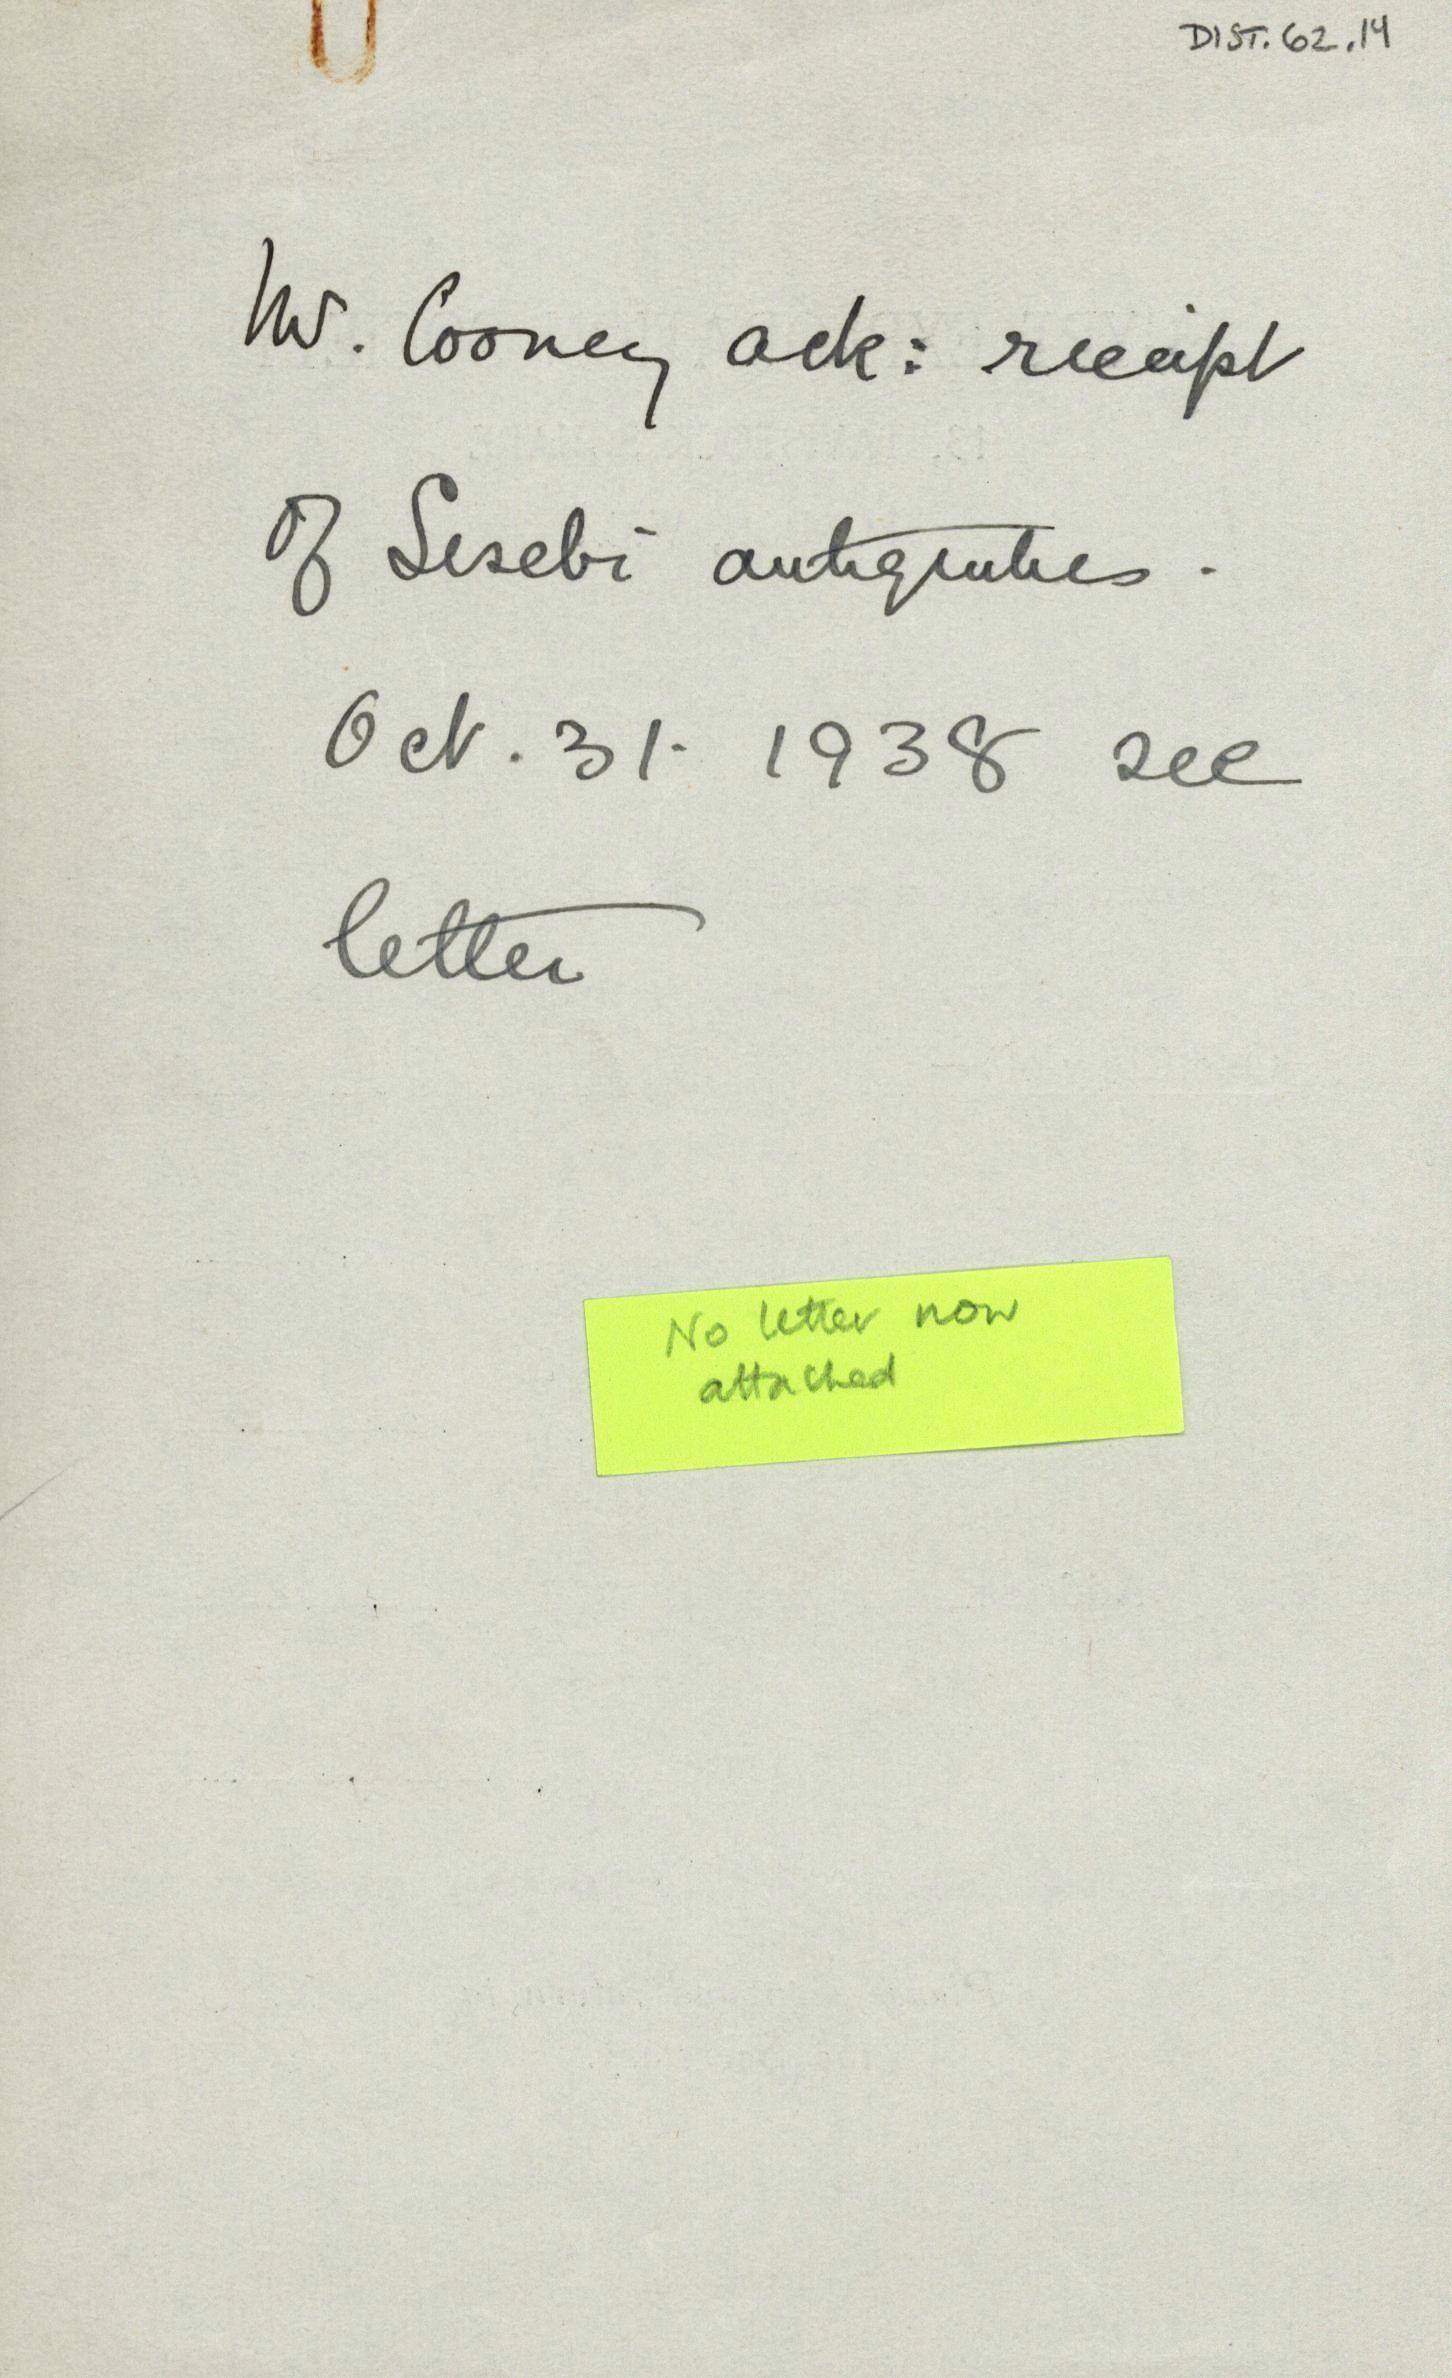 1936-38 Amarah West, Sesebi DIST.62.14